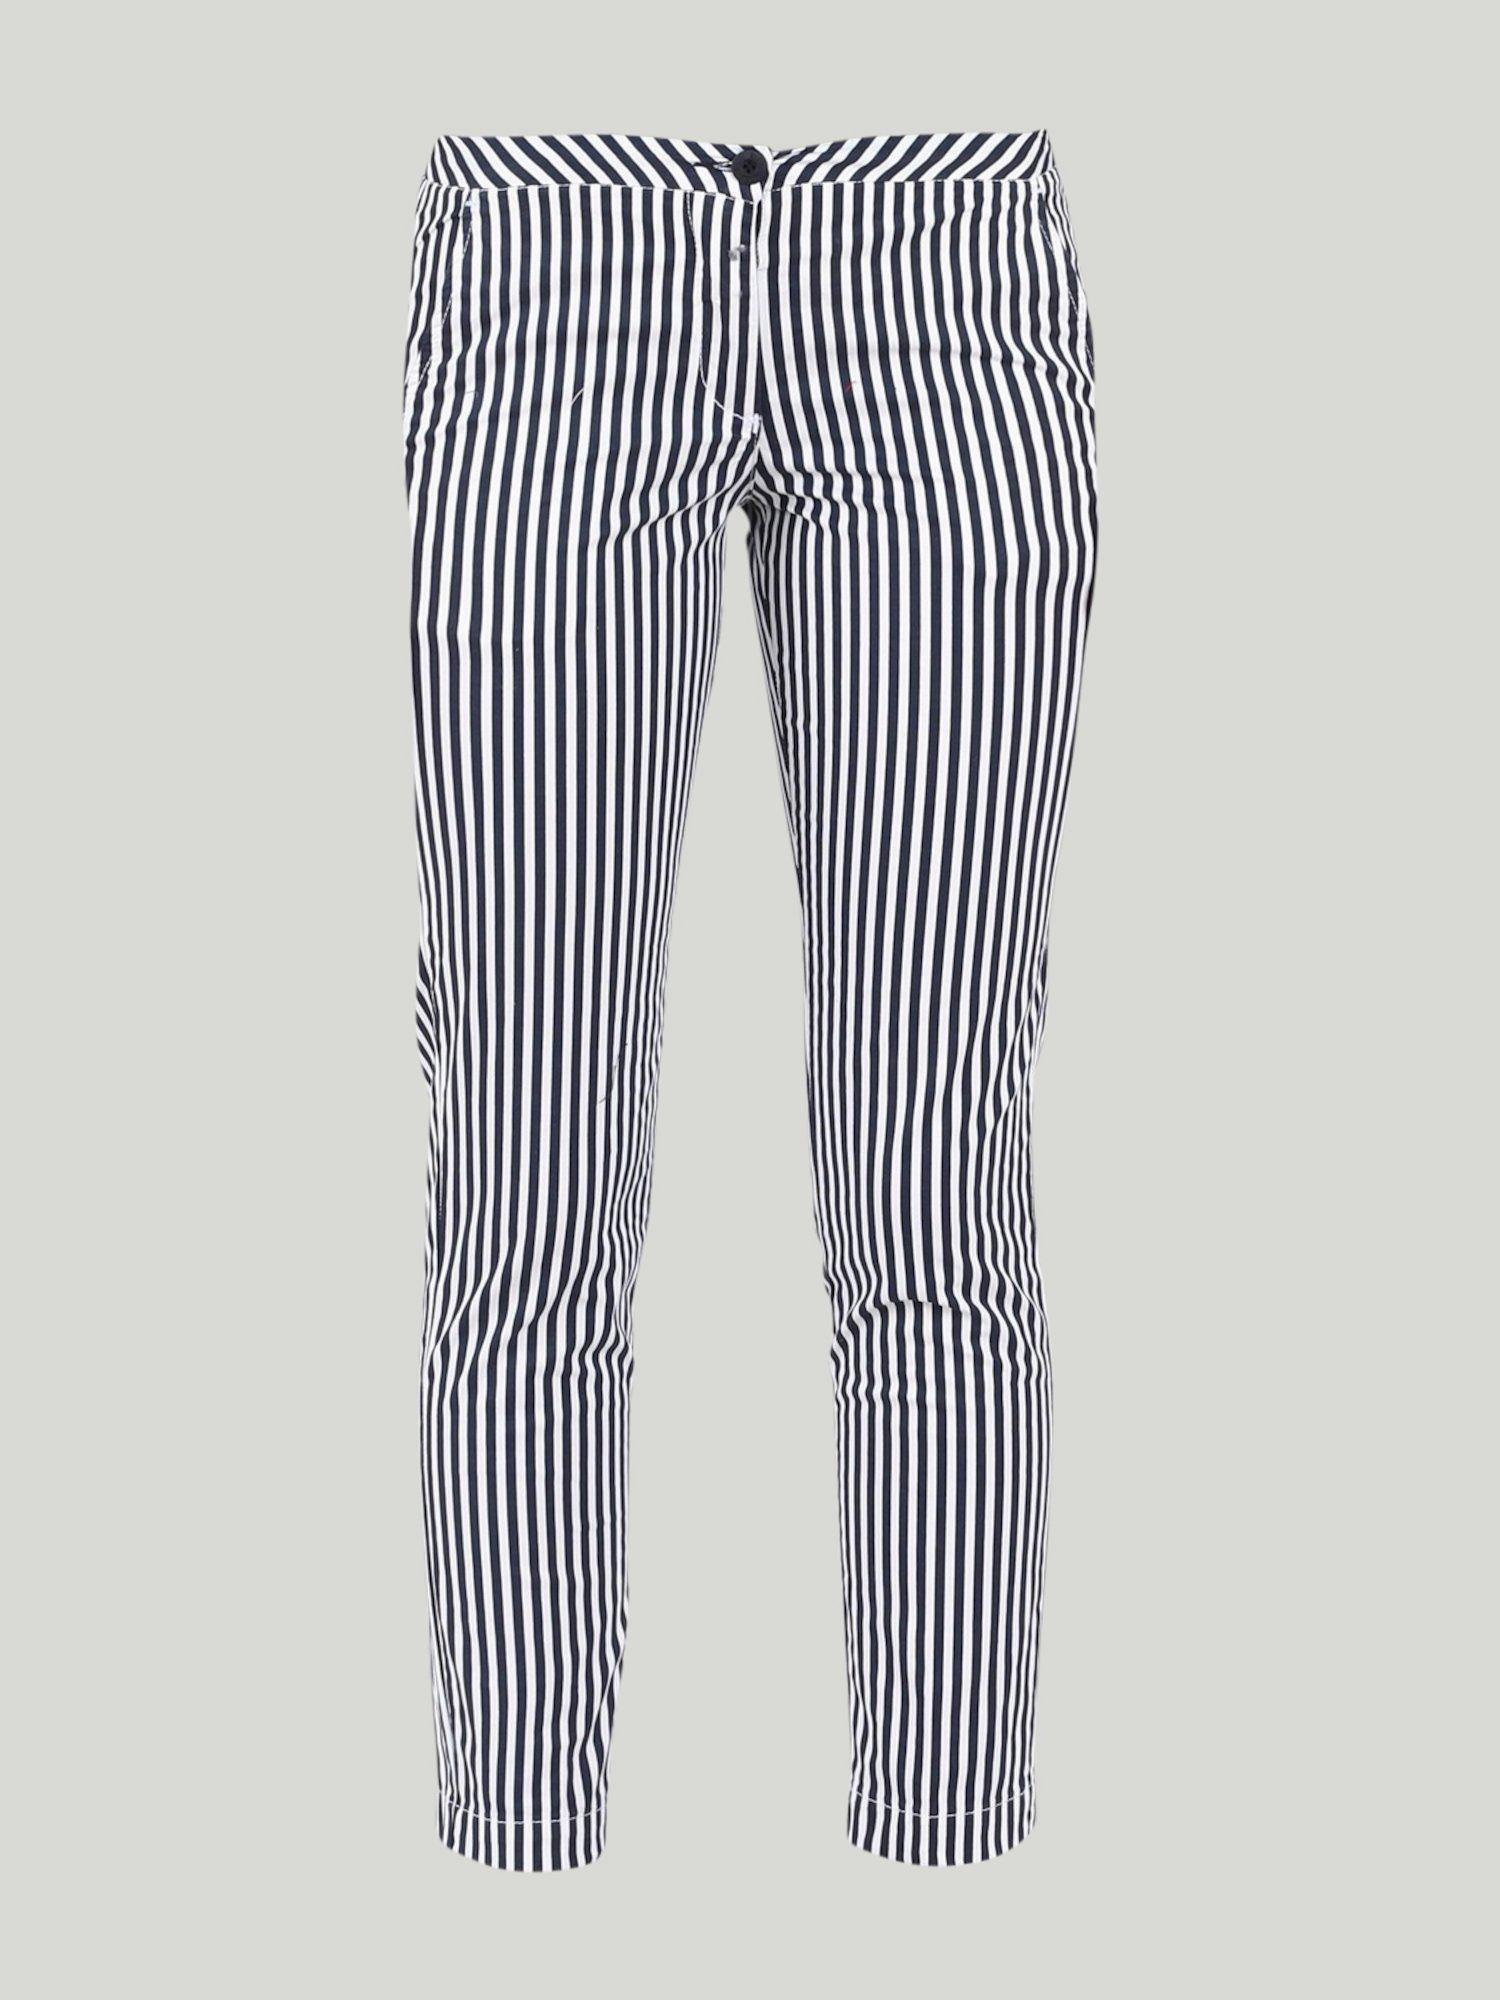 Pineapple pants - White / Navy